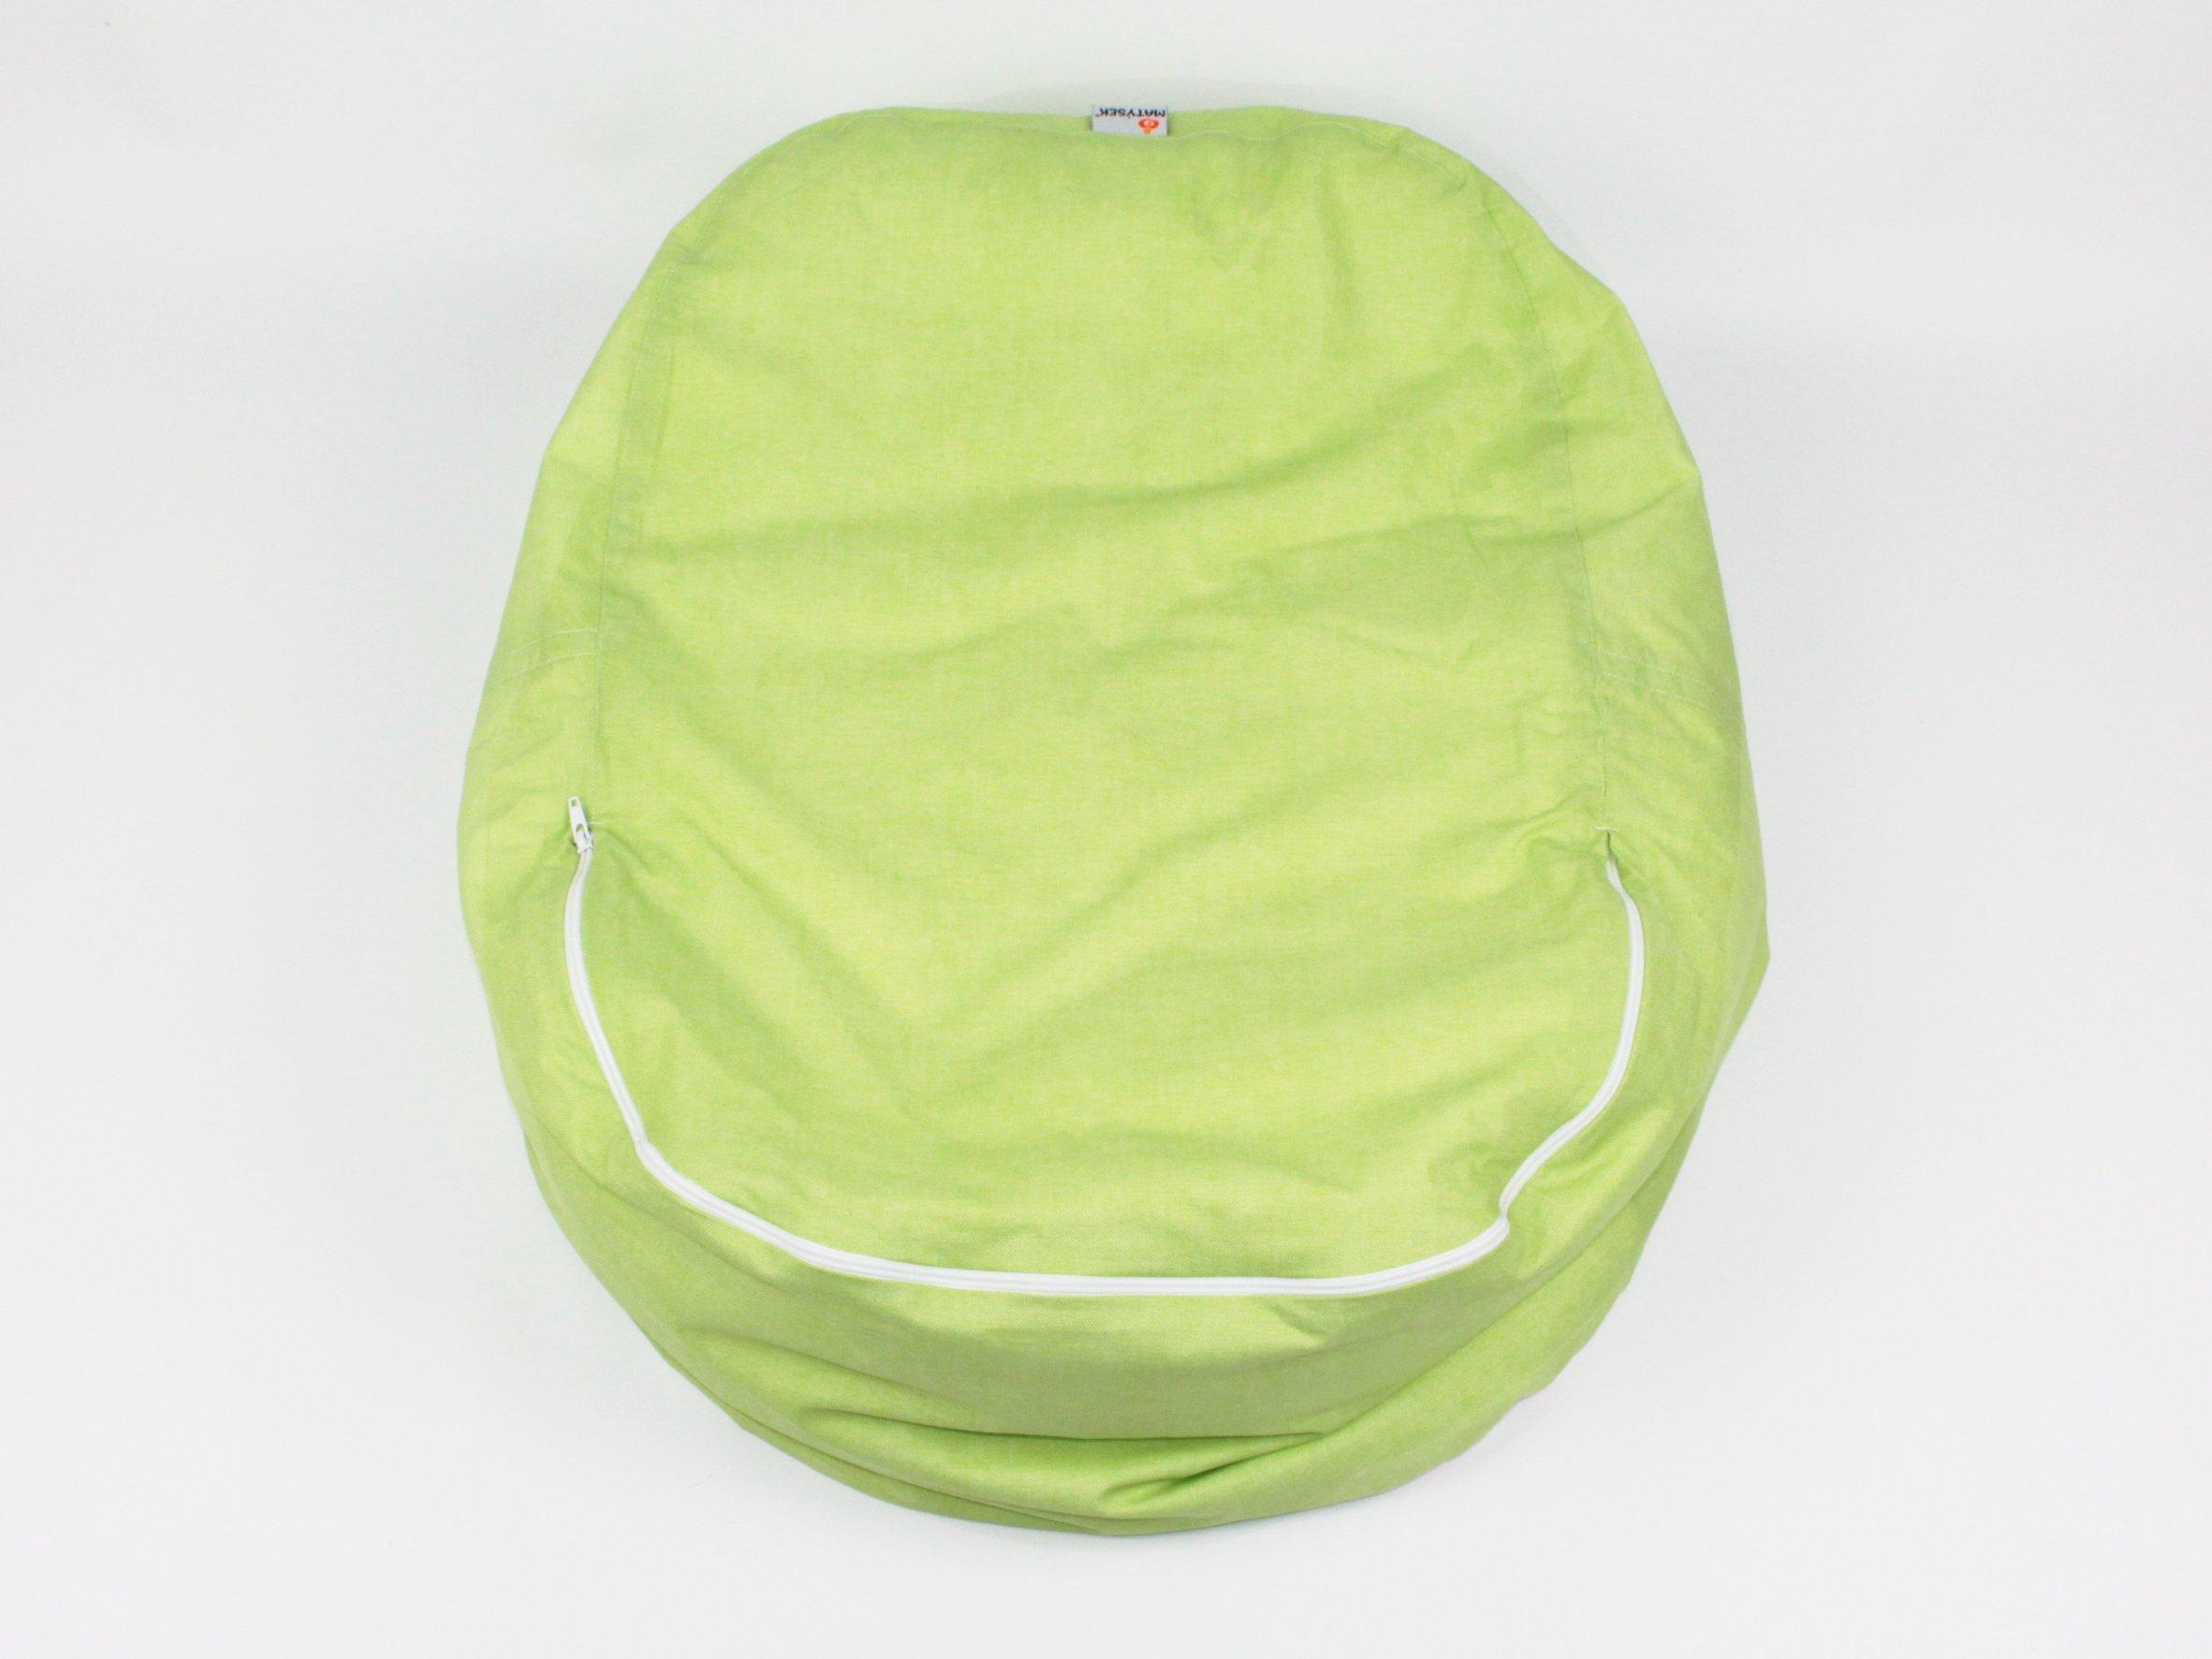 Liegekissen grün Wellen 6